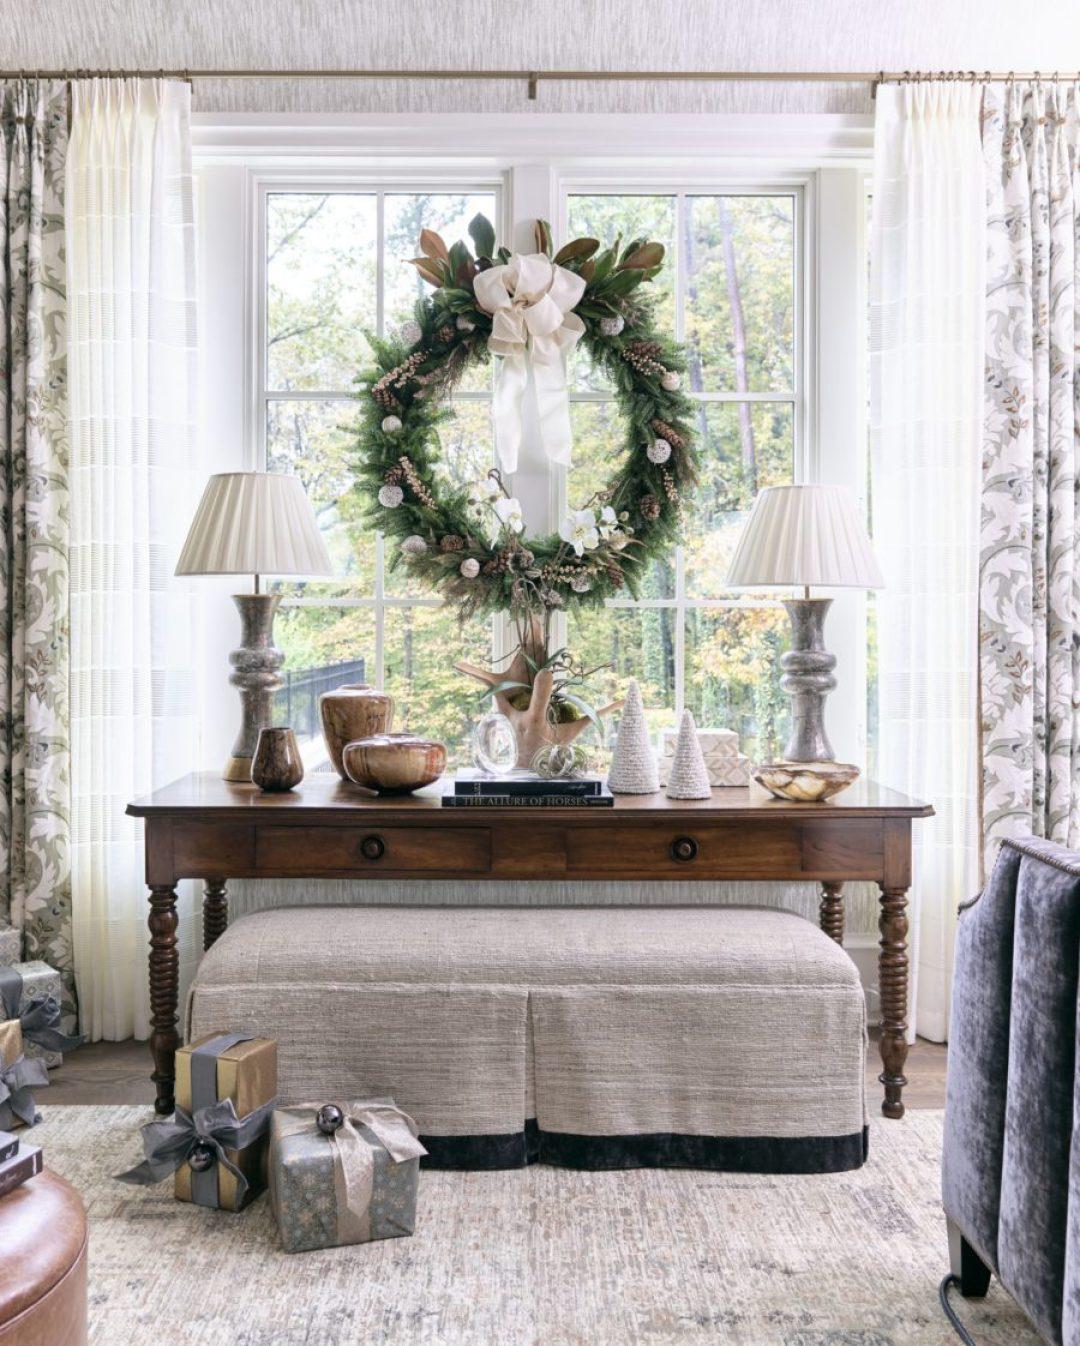 AHL_181113_showhouse32057_Jessica-Bradley Home for the Holidays 2018: Atlanta, GA Style